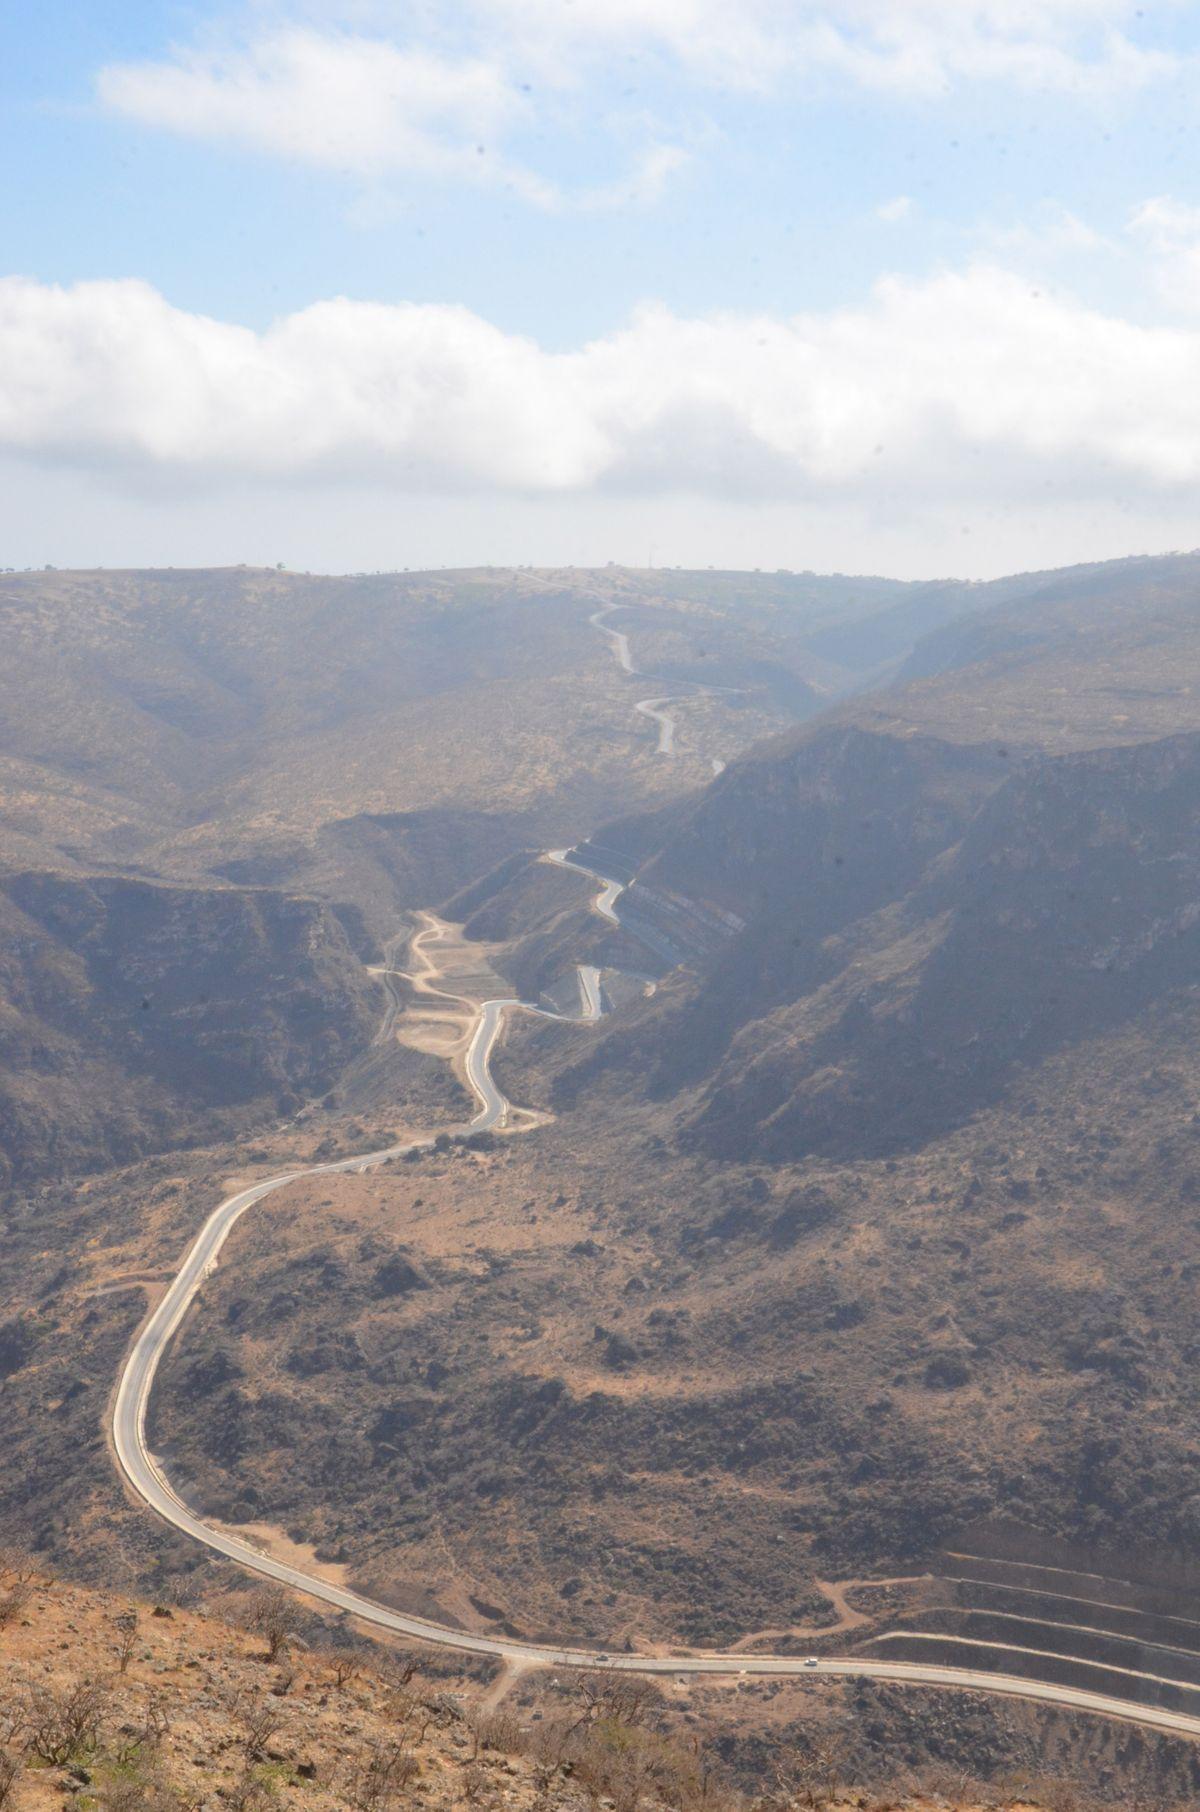 Wild Arabia: How to explore Oman's wild outdoors | Wanderlust